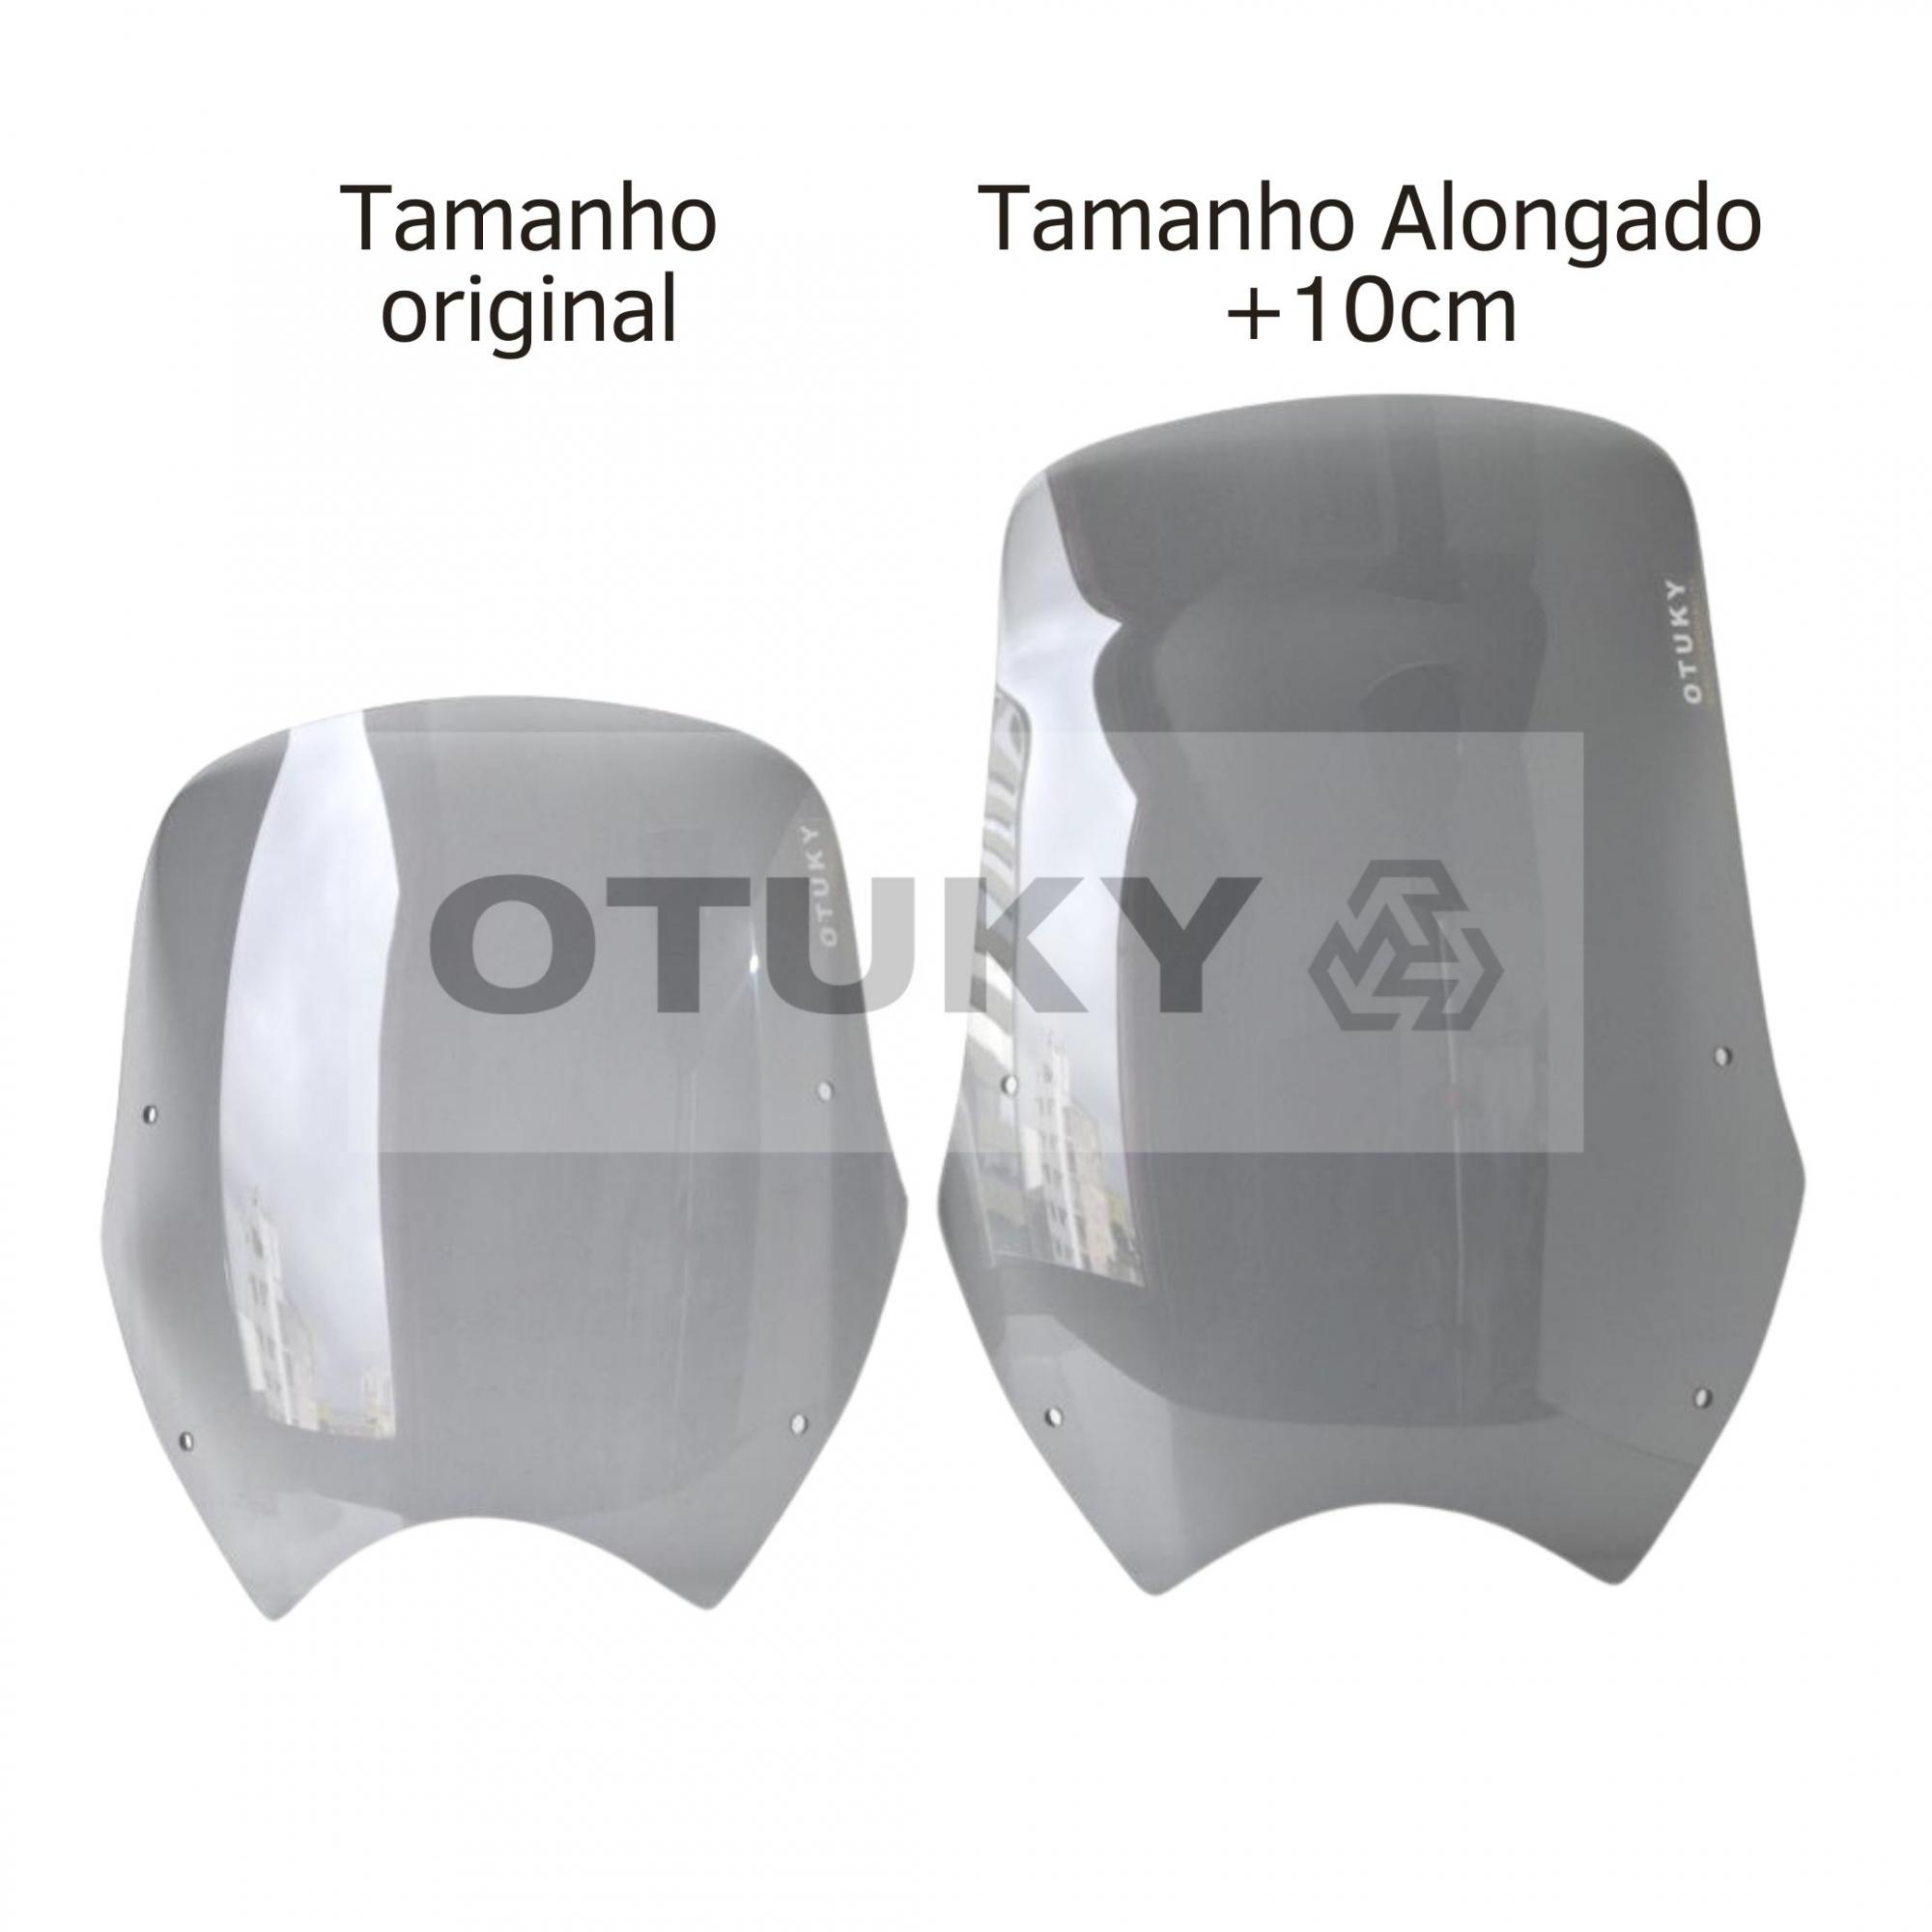 Bolha para Moto Transalp XL 700 V Otuky Alongada Fume Cinza